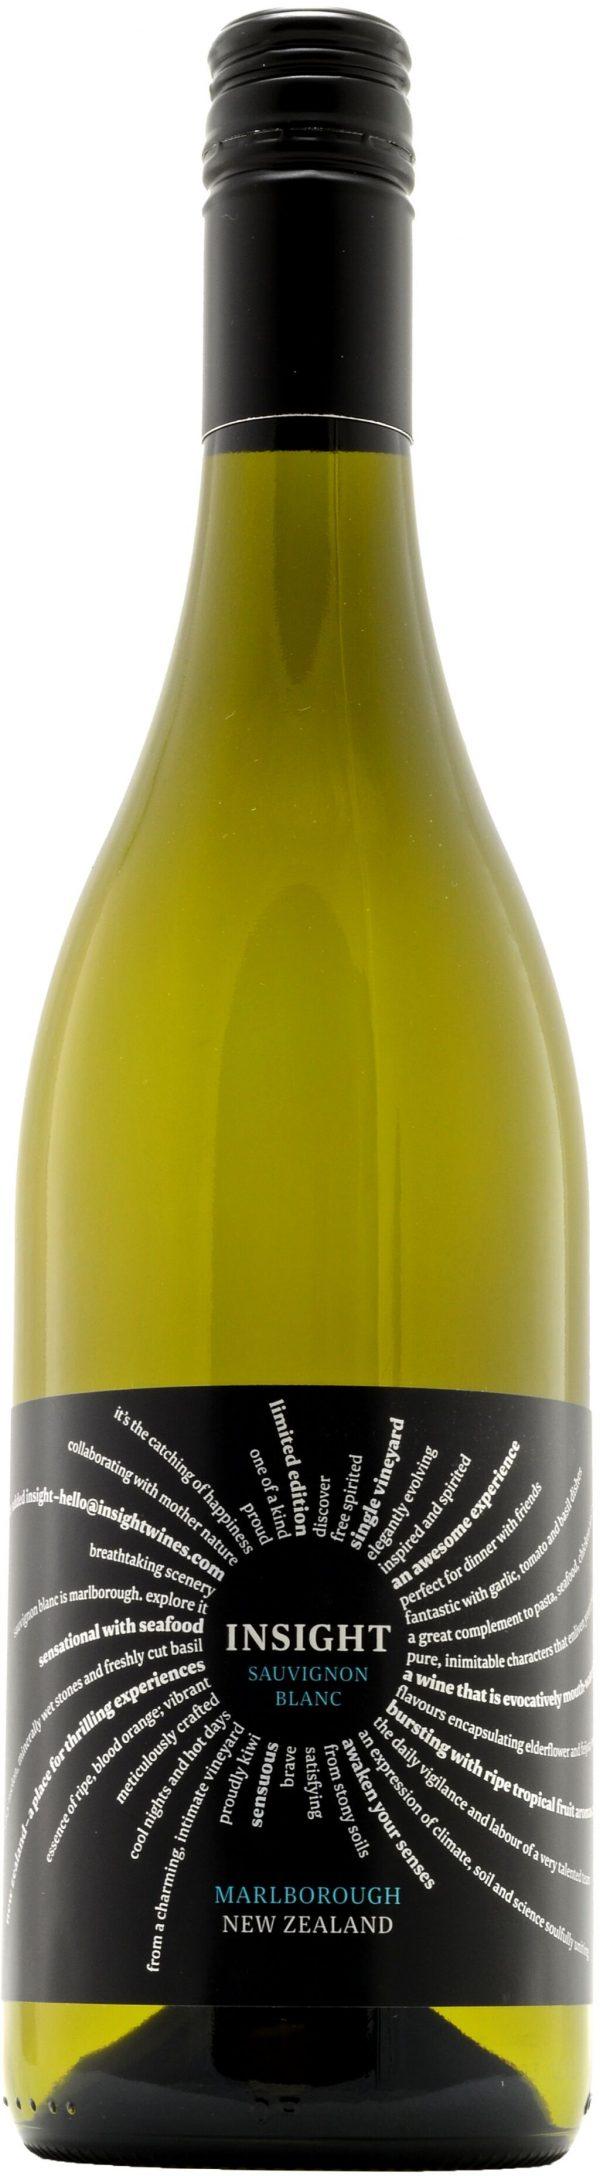 Insight Sauvignon Blanc 75cl